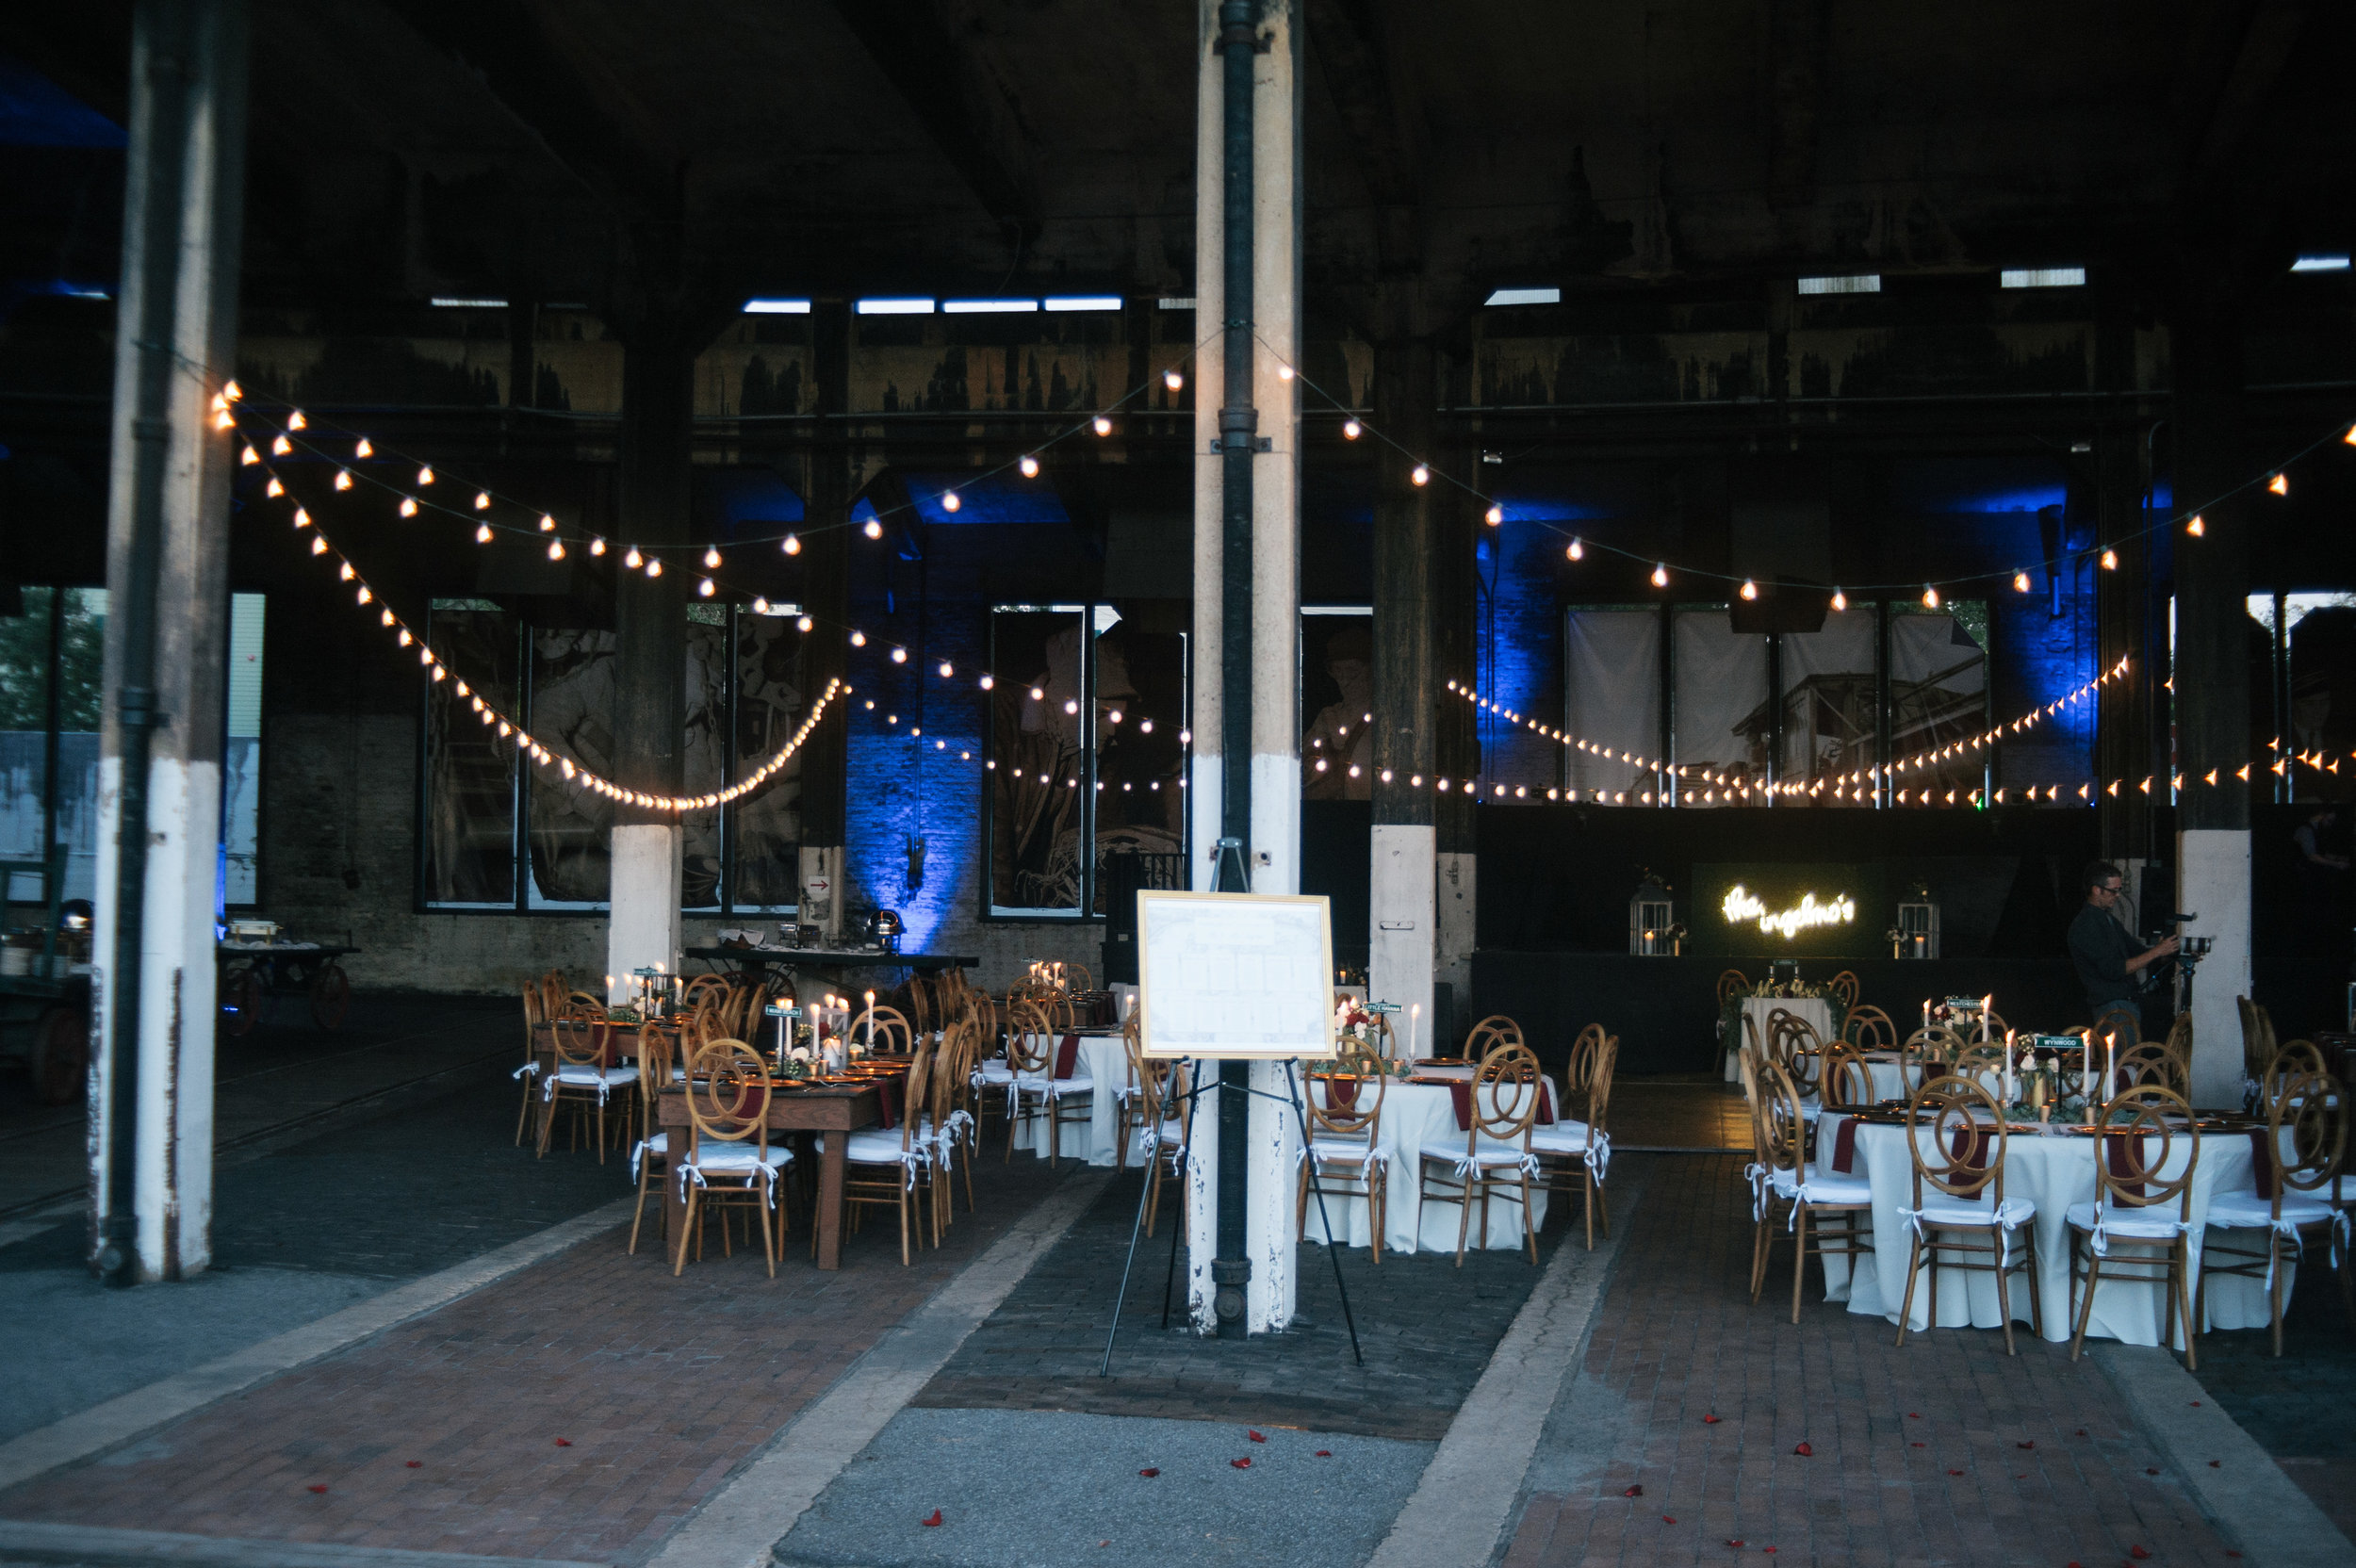 Iggy-and-yesenia-savannah-railroad-museum-wedding-meg-hill-photo- (663 of 866).jpg